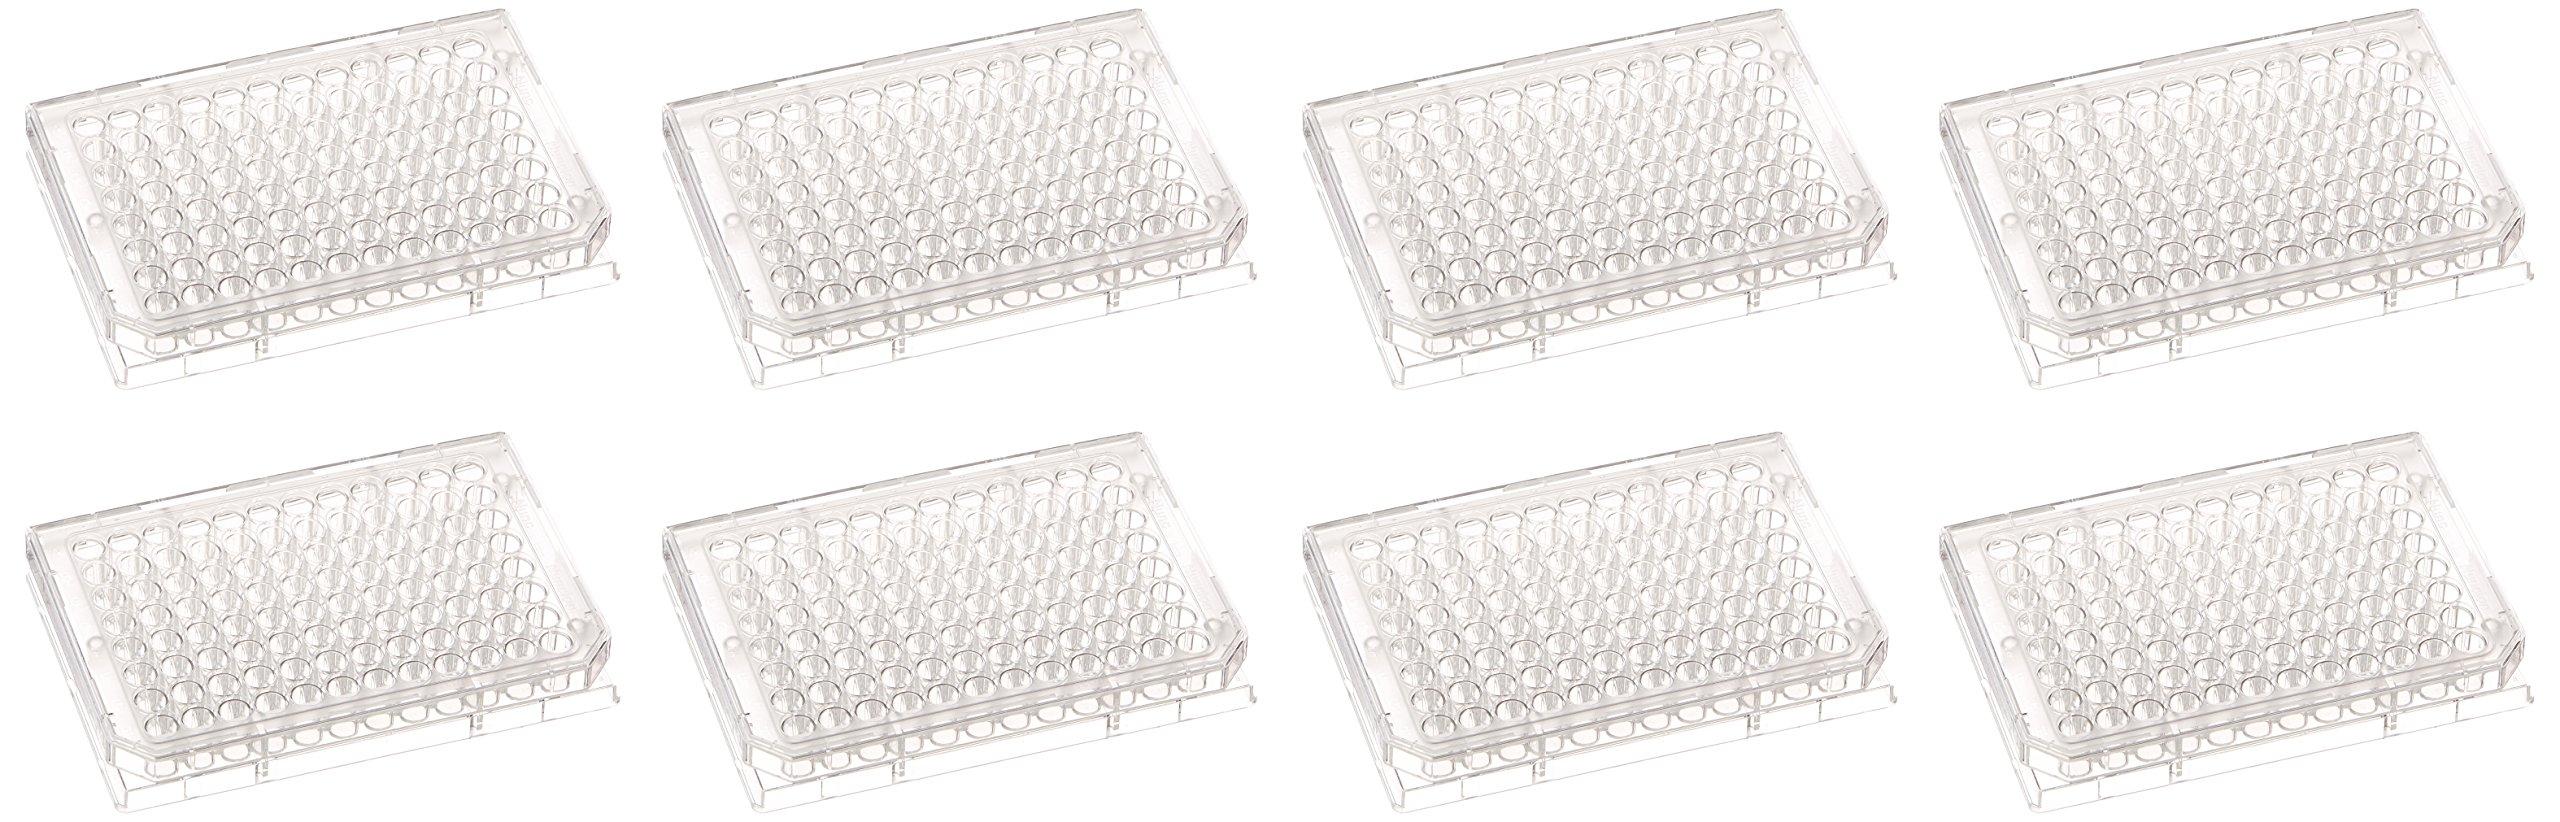 Nunc 174927 Nunclon Sphera Microplate, 400 μL Volume (Pack of 8)